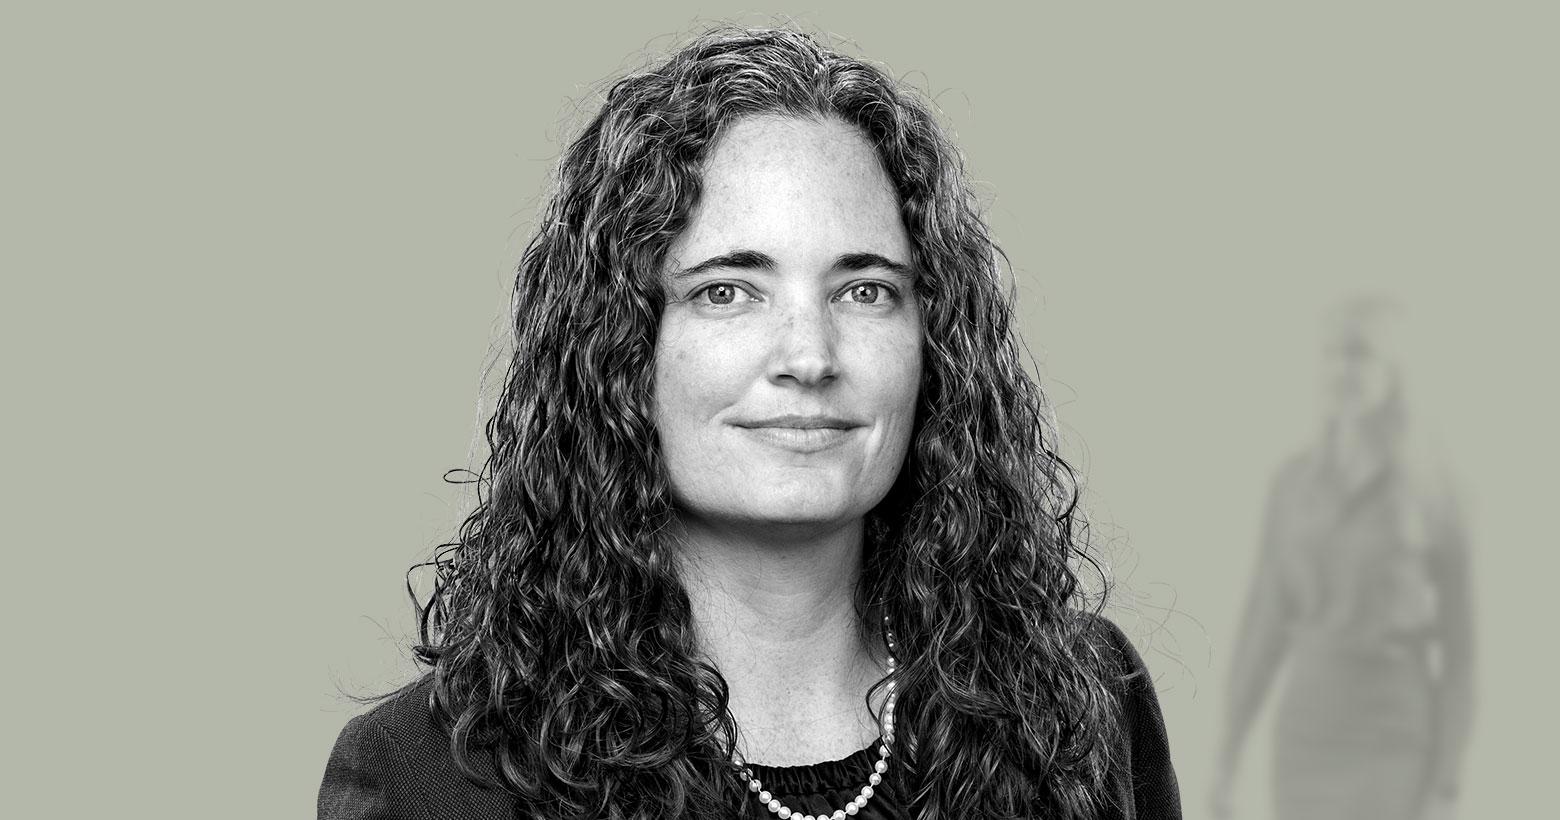 Carolyn S. Houston